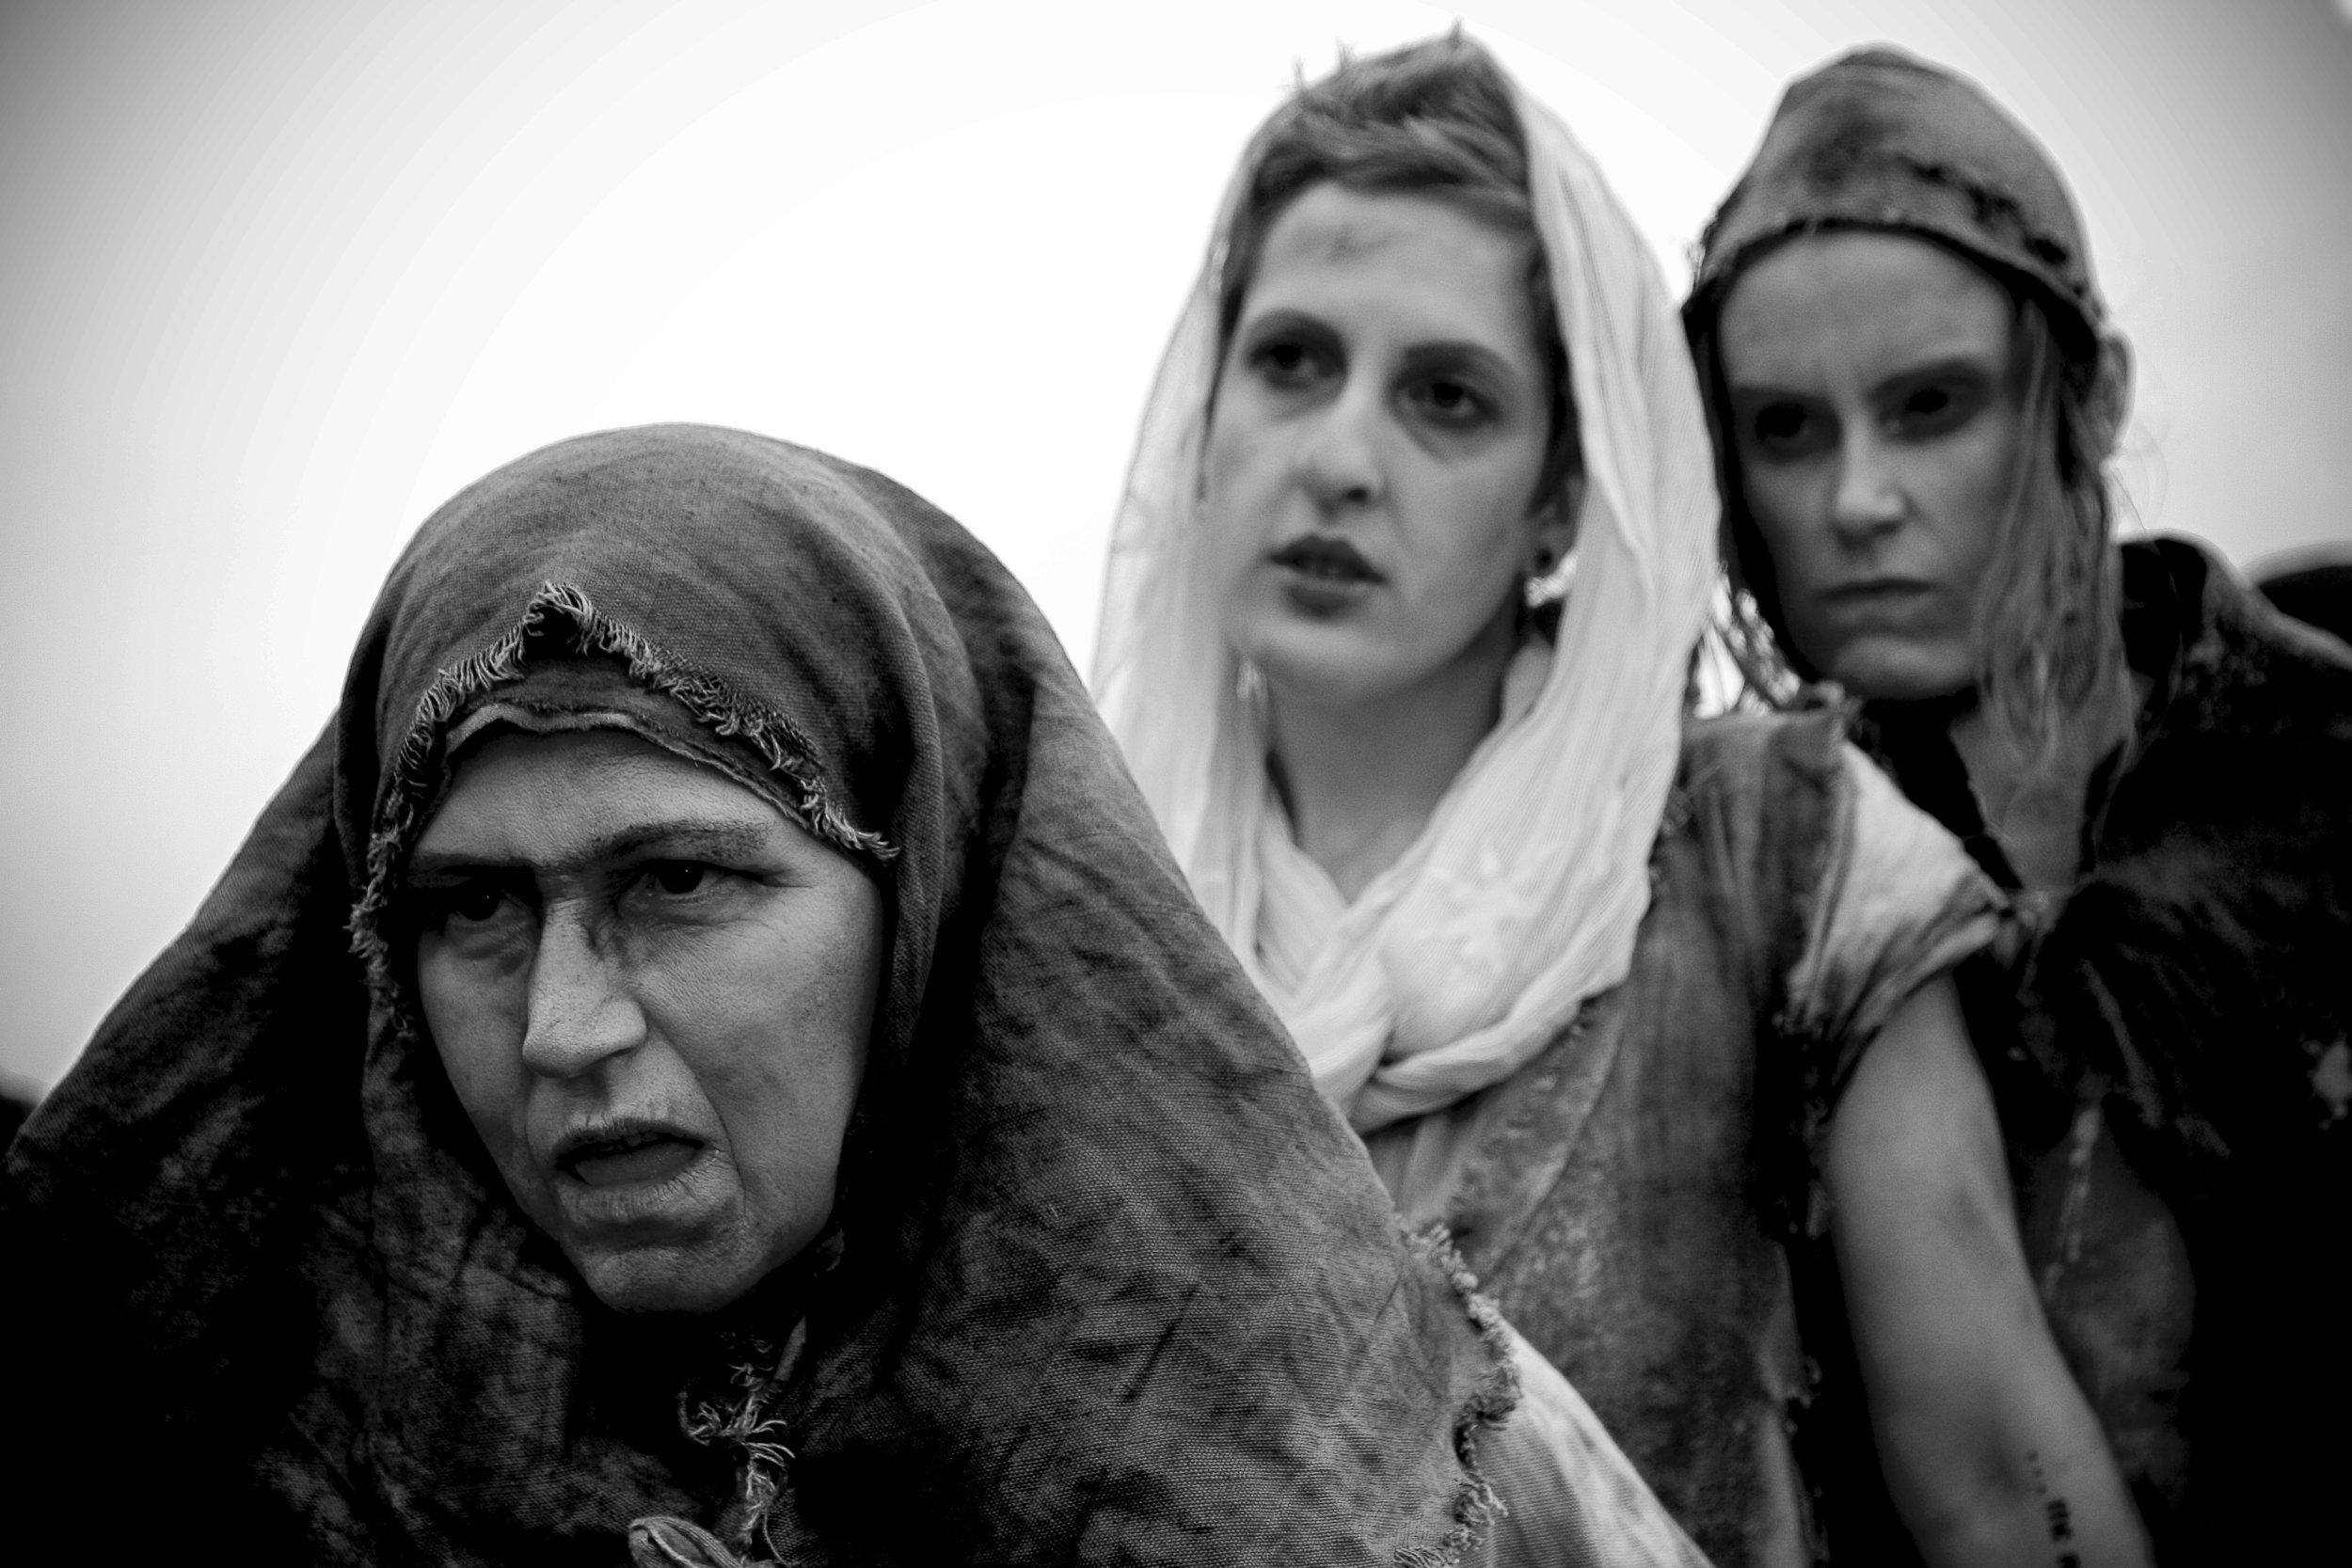 2010; Macbeth; Jane Windsor-Smith/Gil Garland